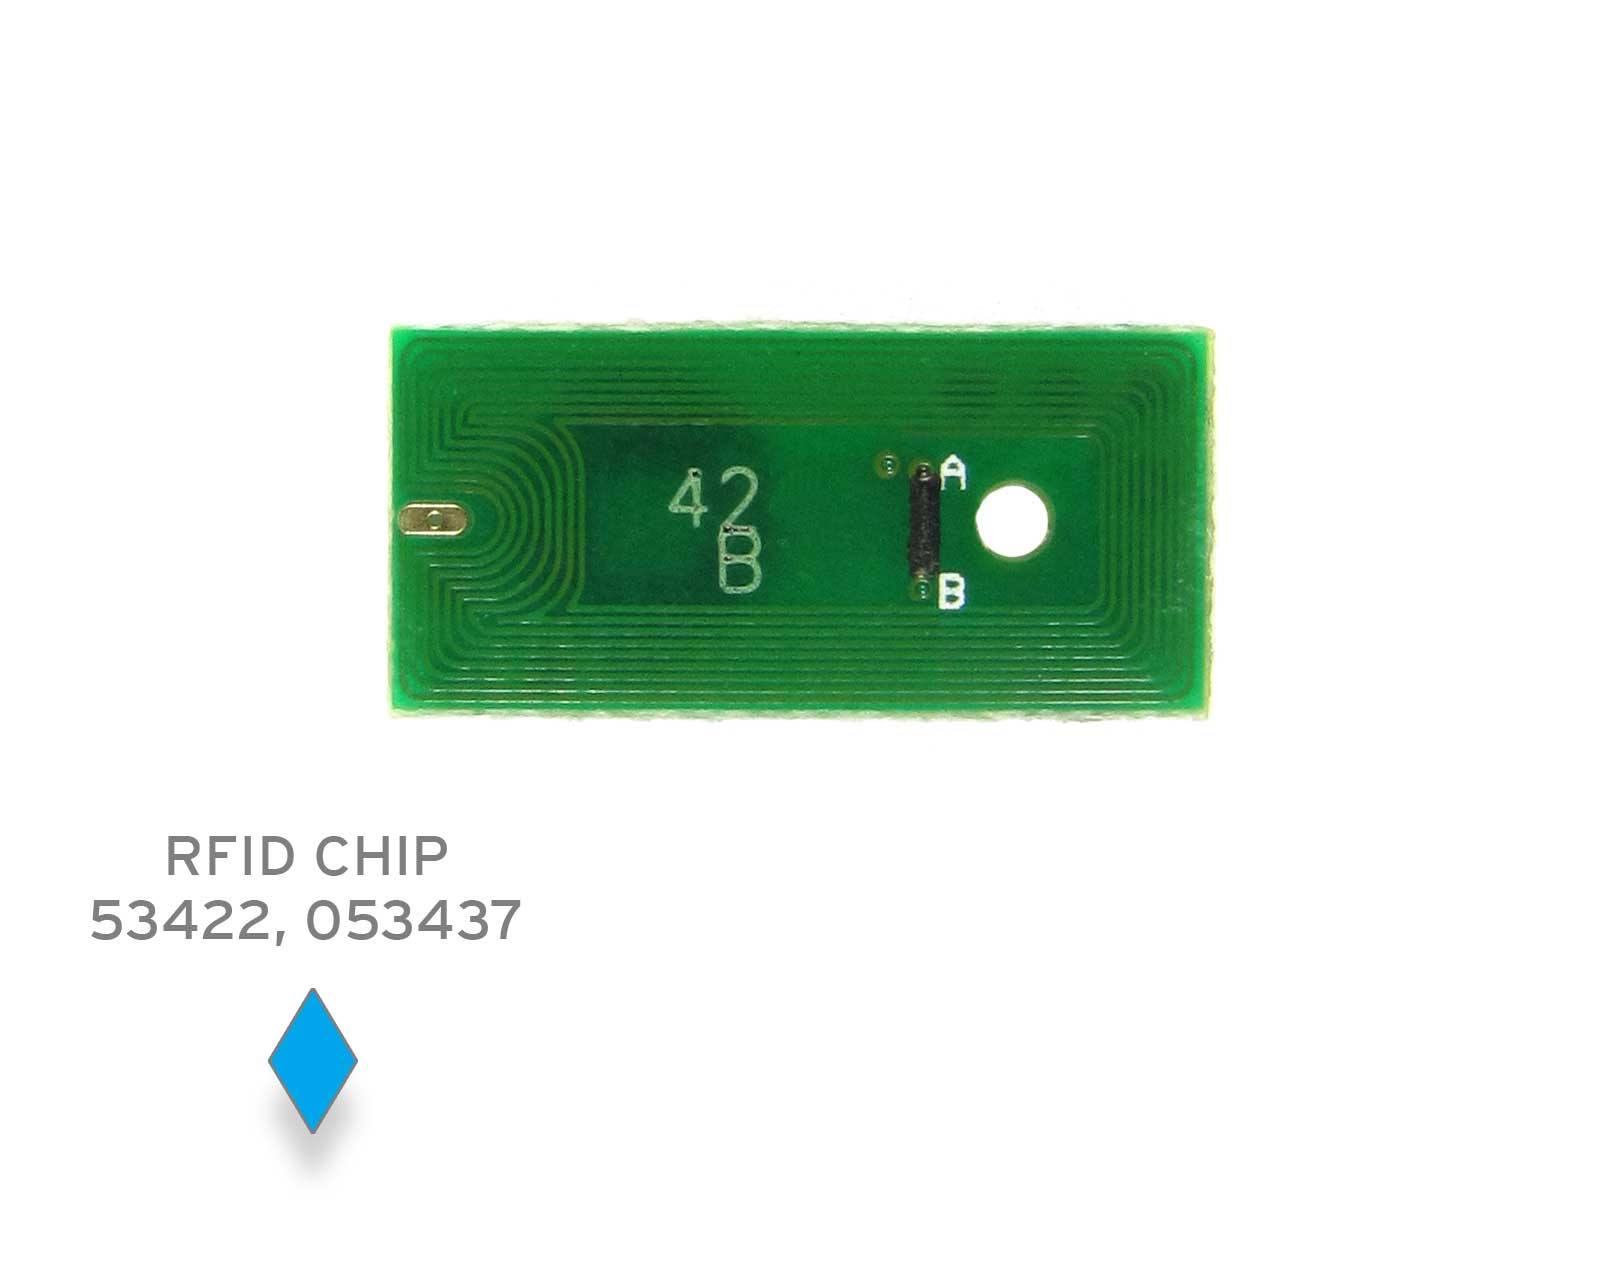 Chip for Primera LX 900 C cyan, single-use